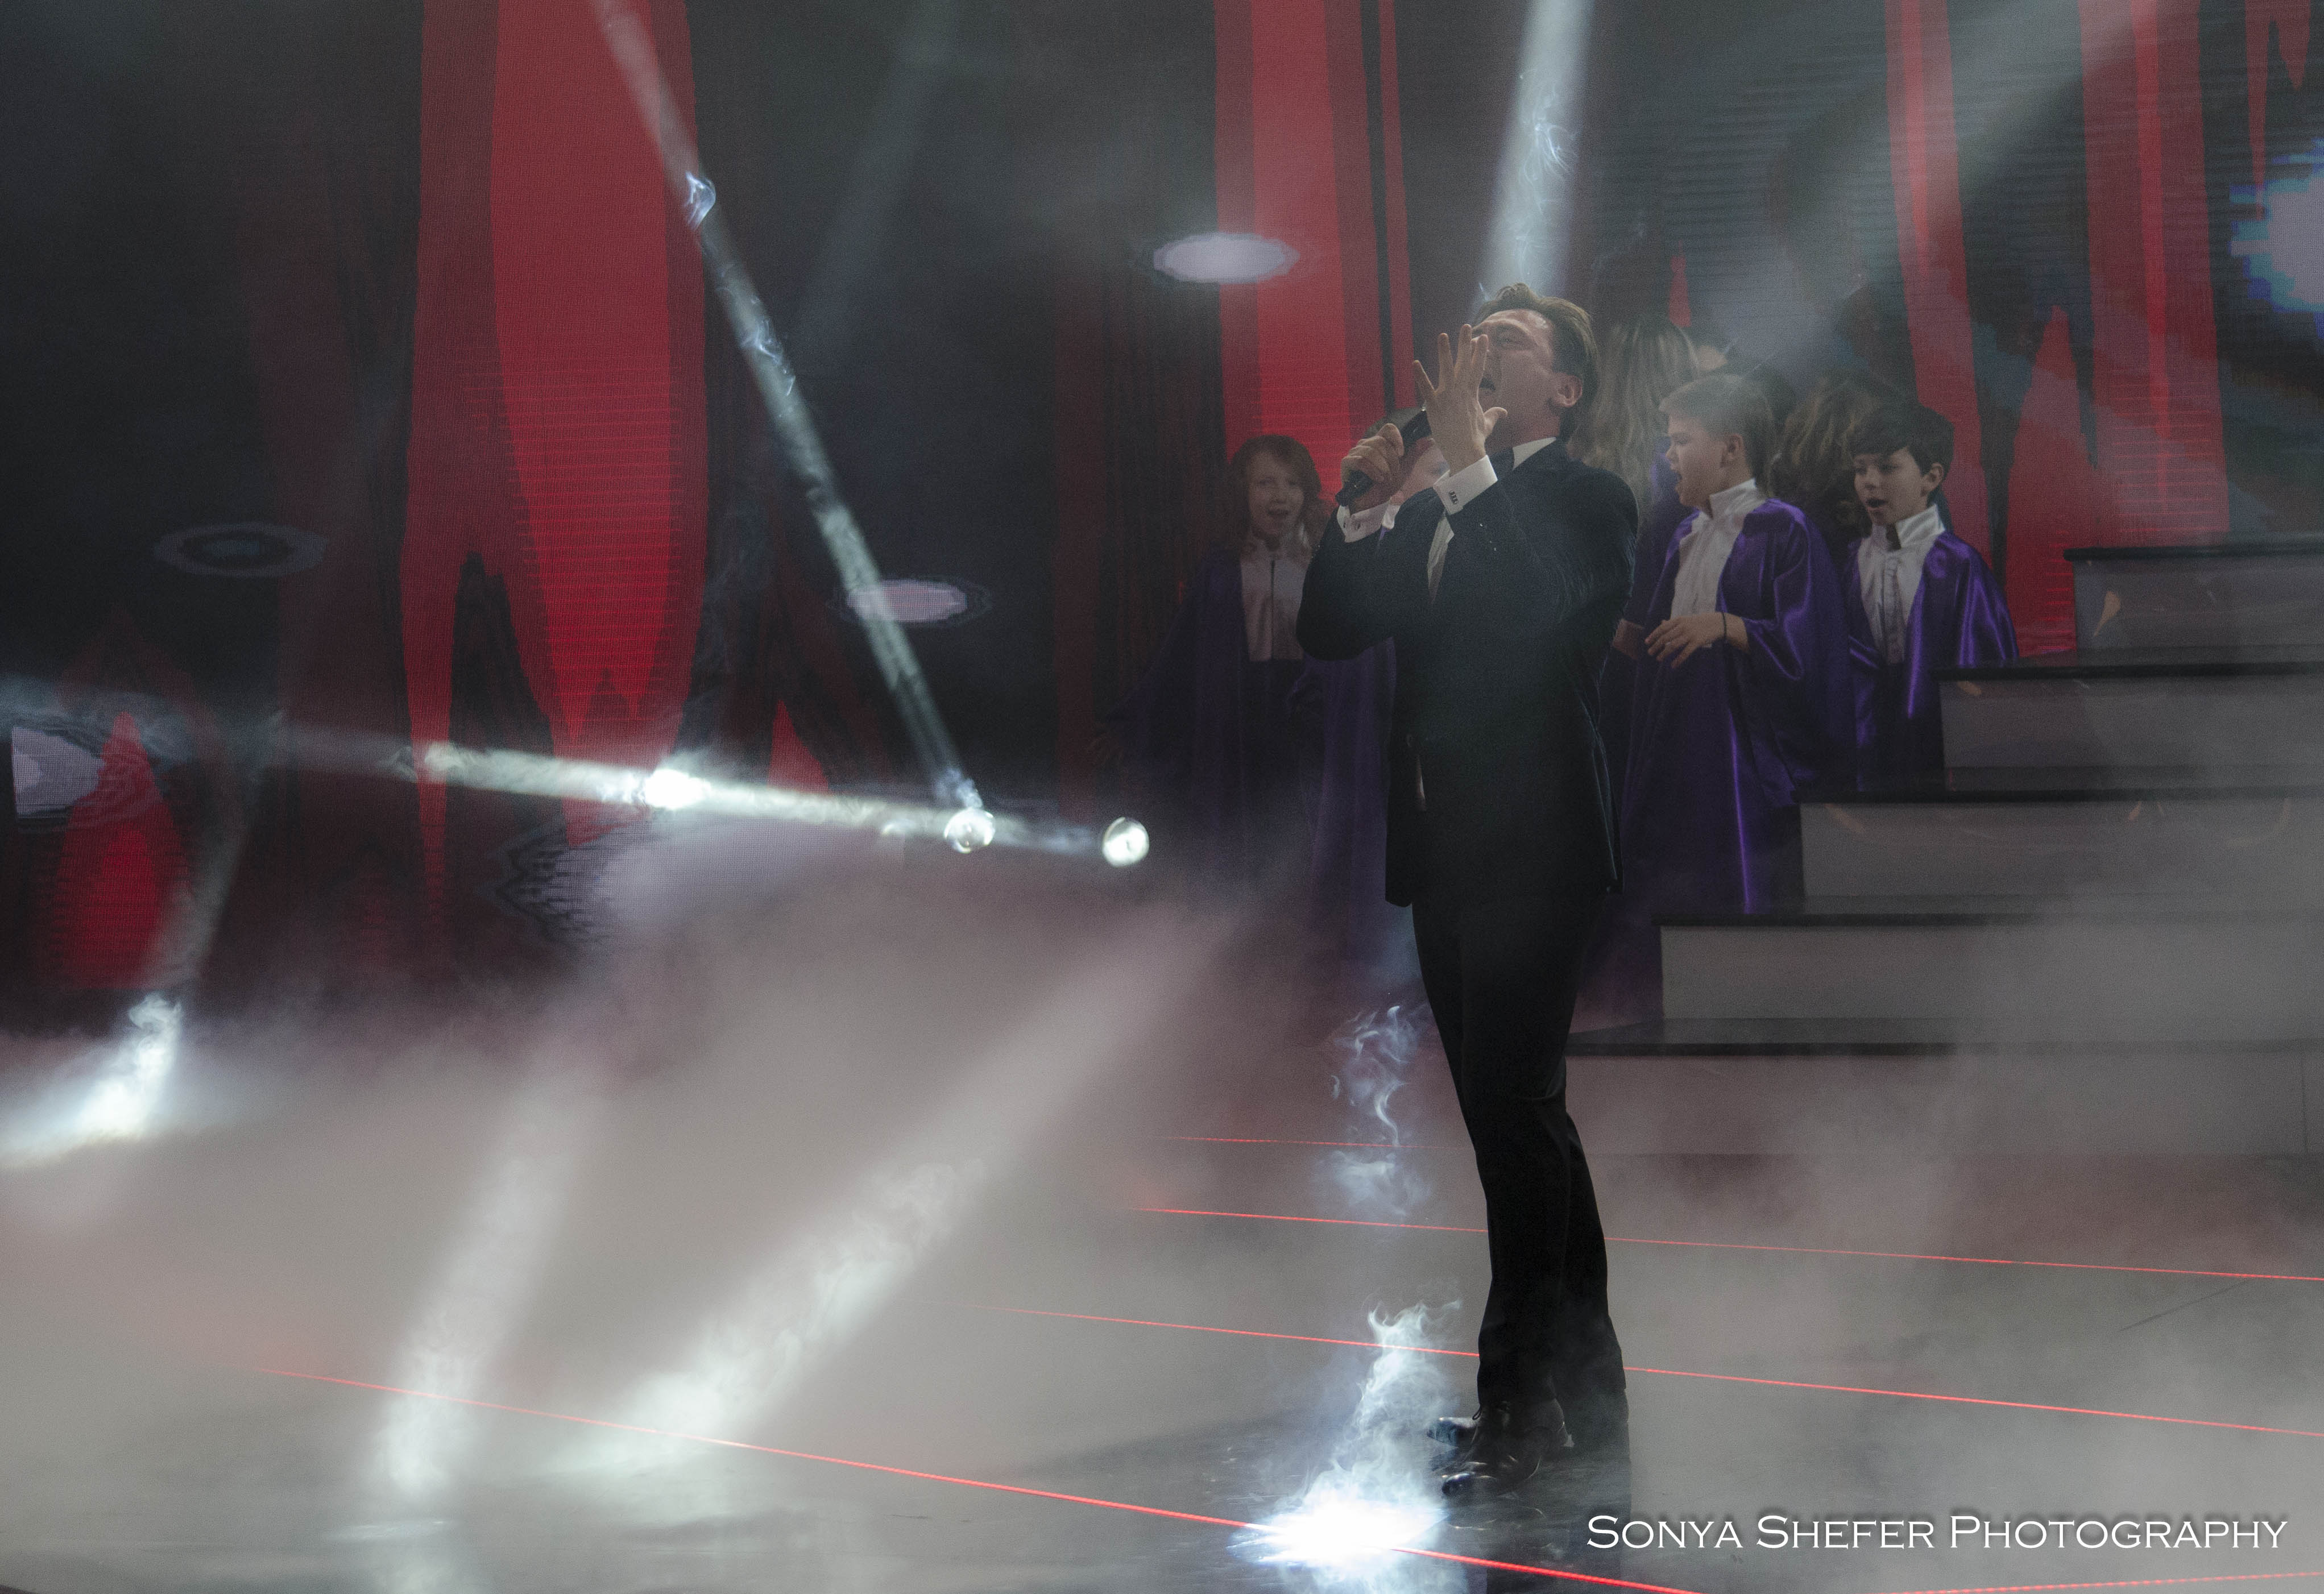 Ruslan-Concertn-31.12.2016 (14 of 16)